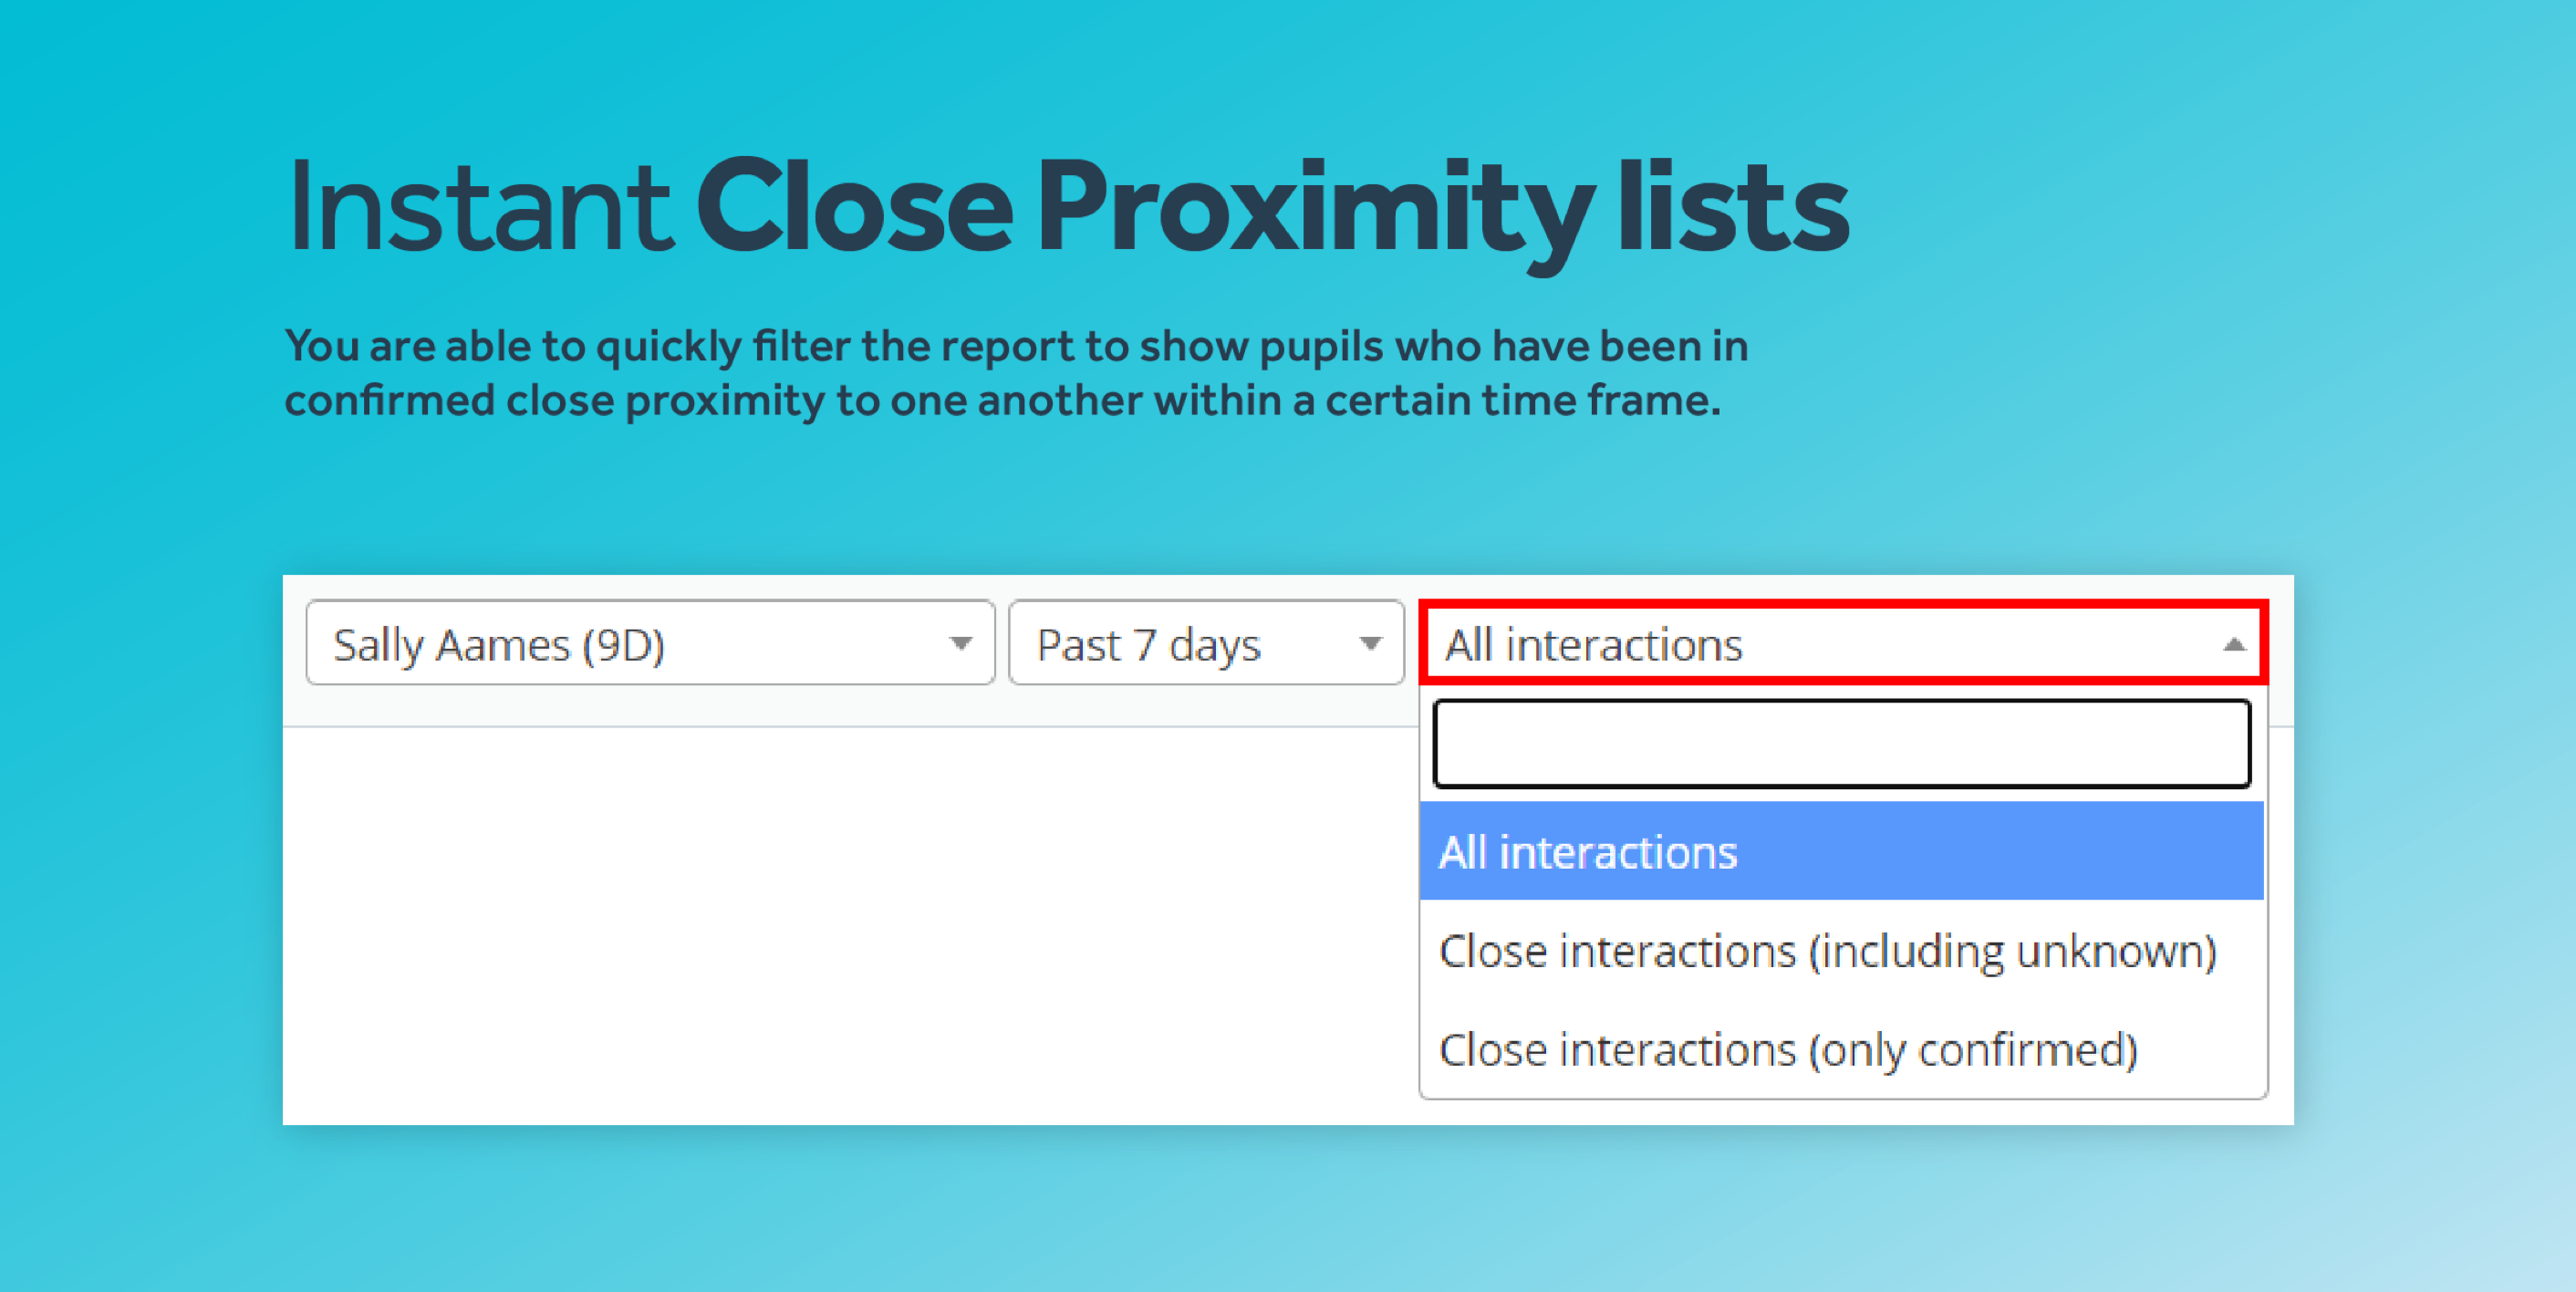 Close proximity lists